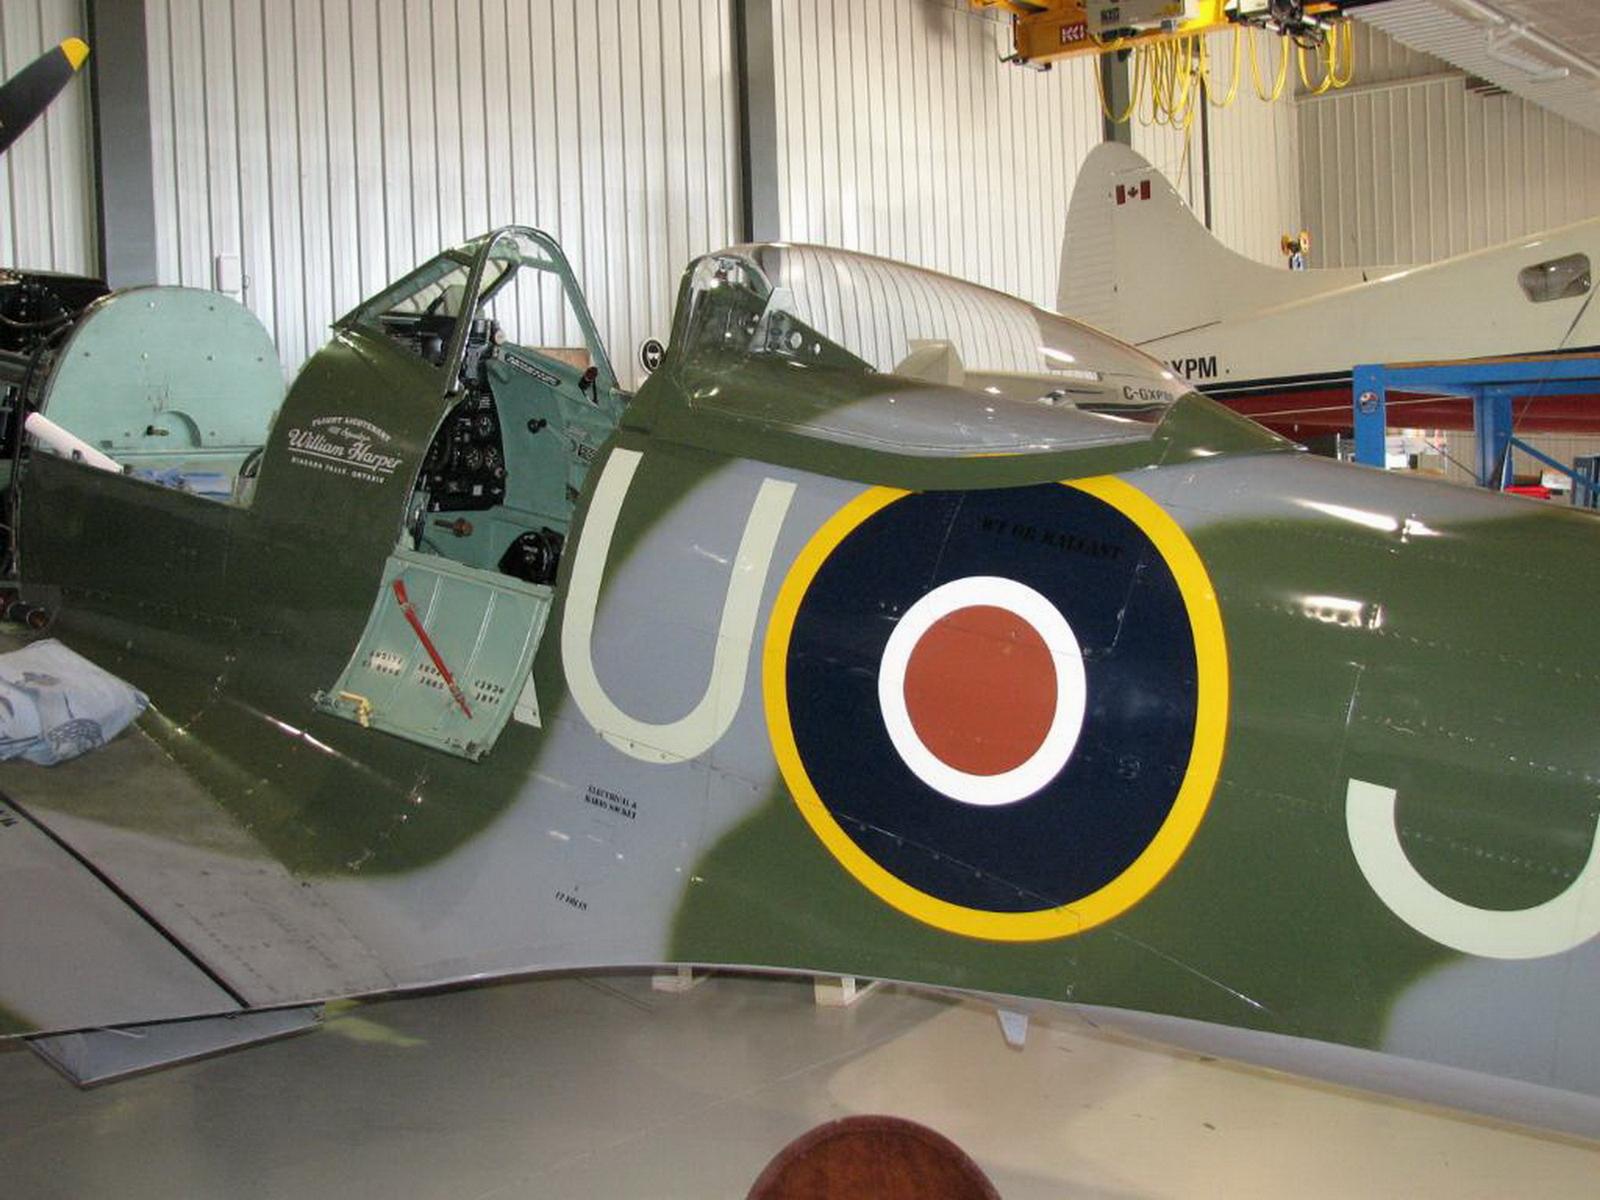 ВАЛК! Supermarine Spitfire Mk XVIe 2df1d7212341